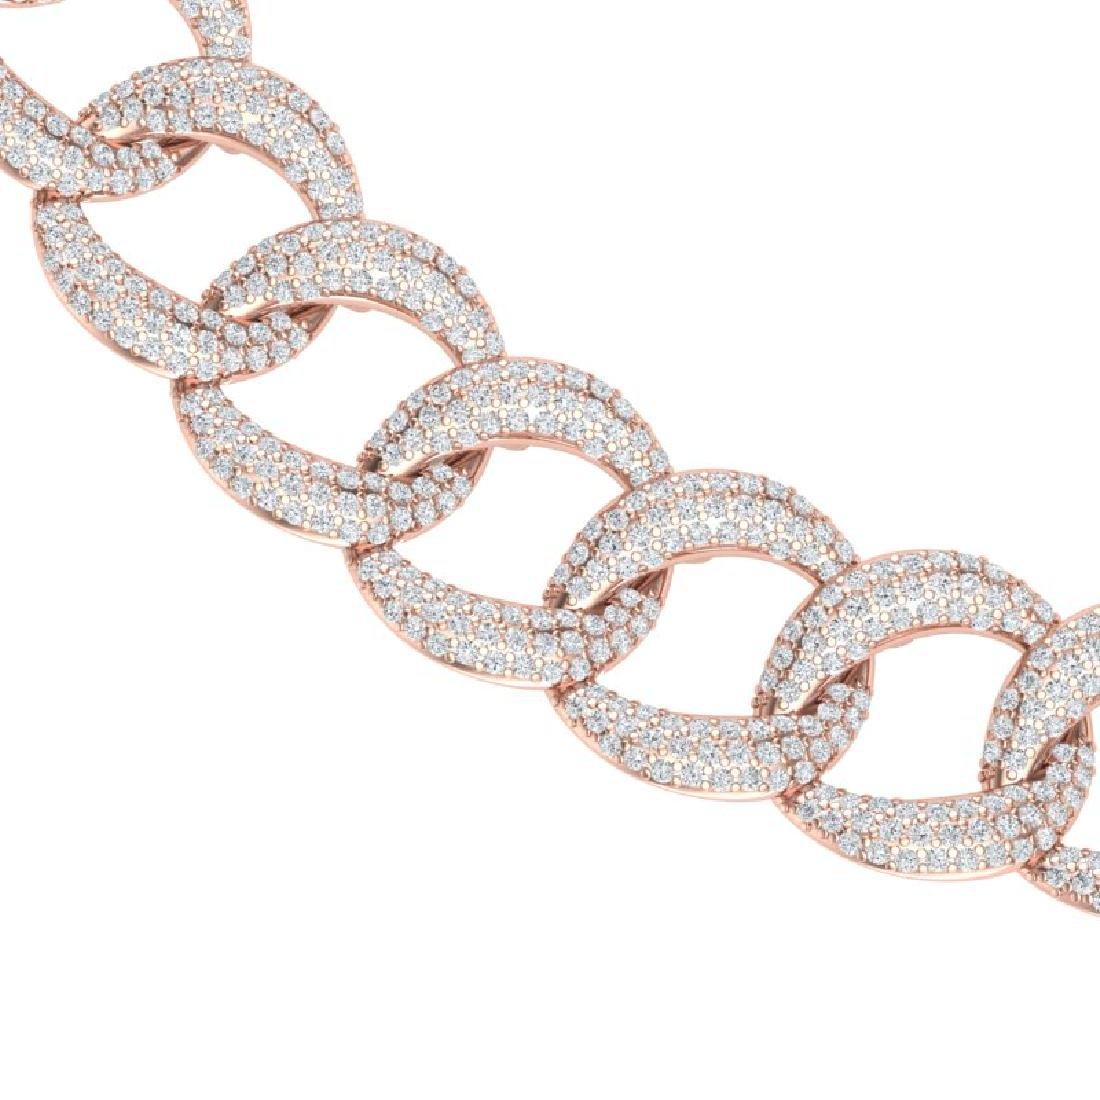 22 CTW Certified VS/SI Diamond Necklace 18K Rose Gold - 2